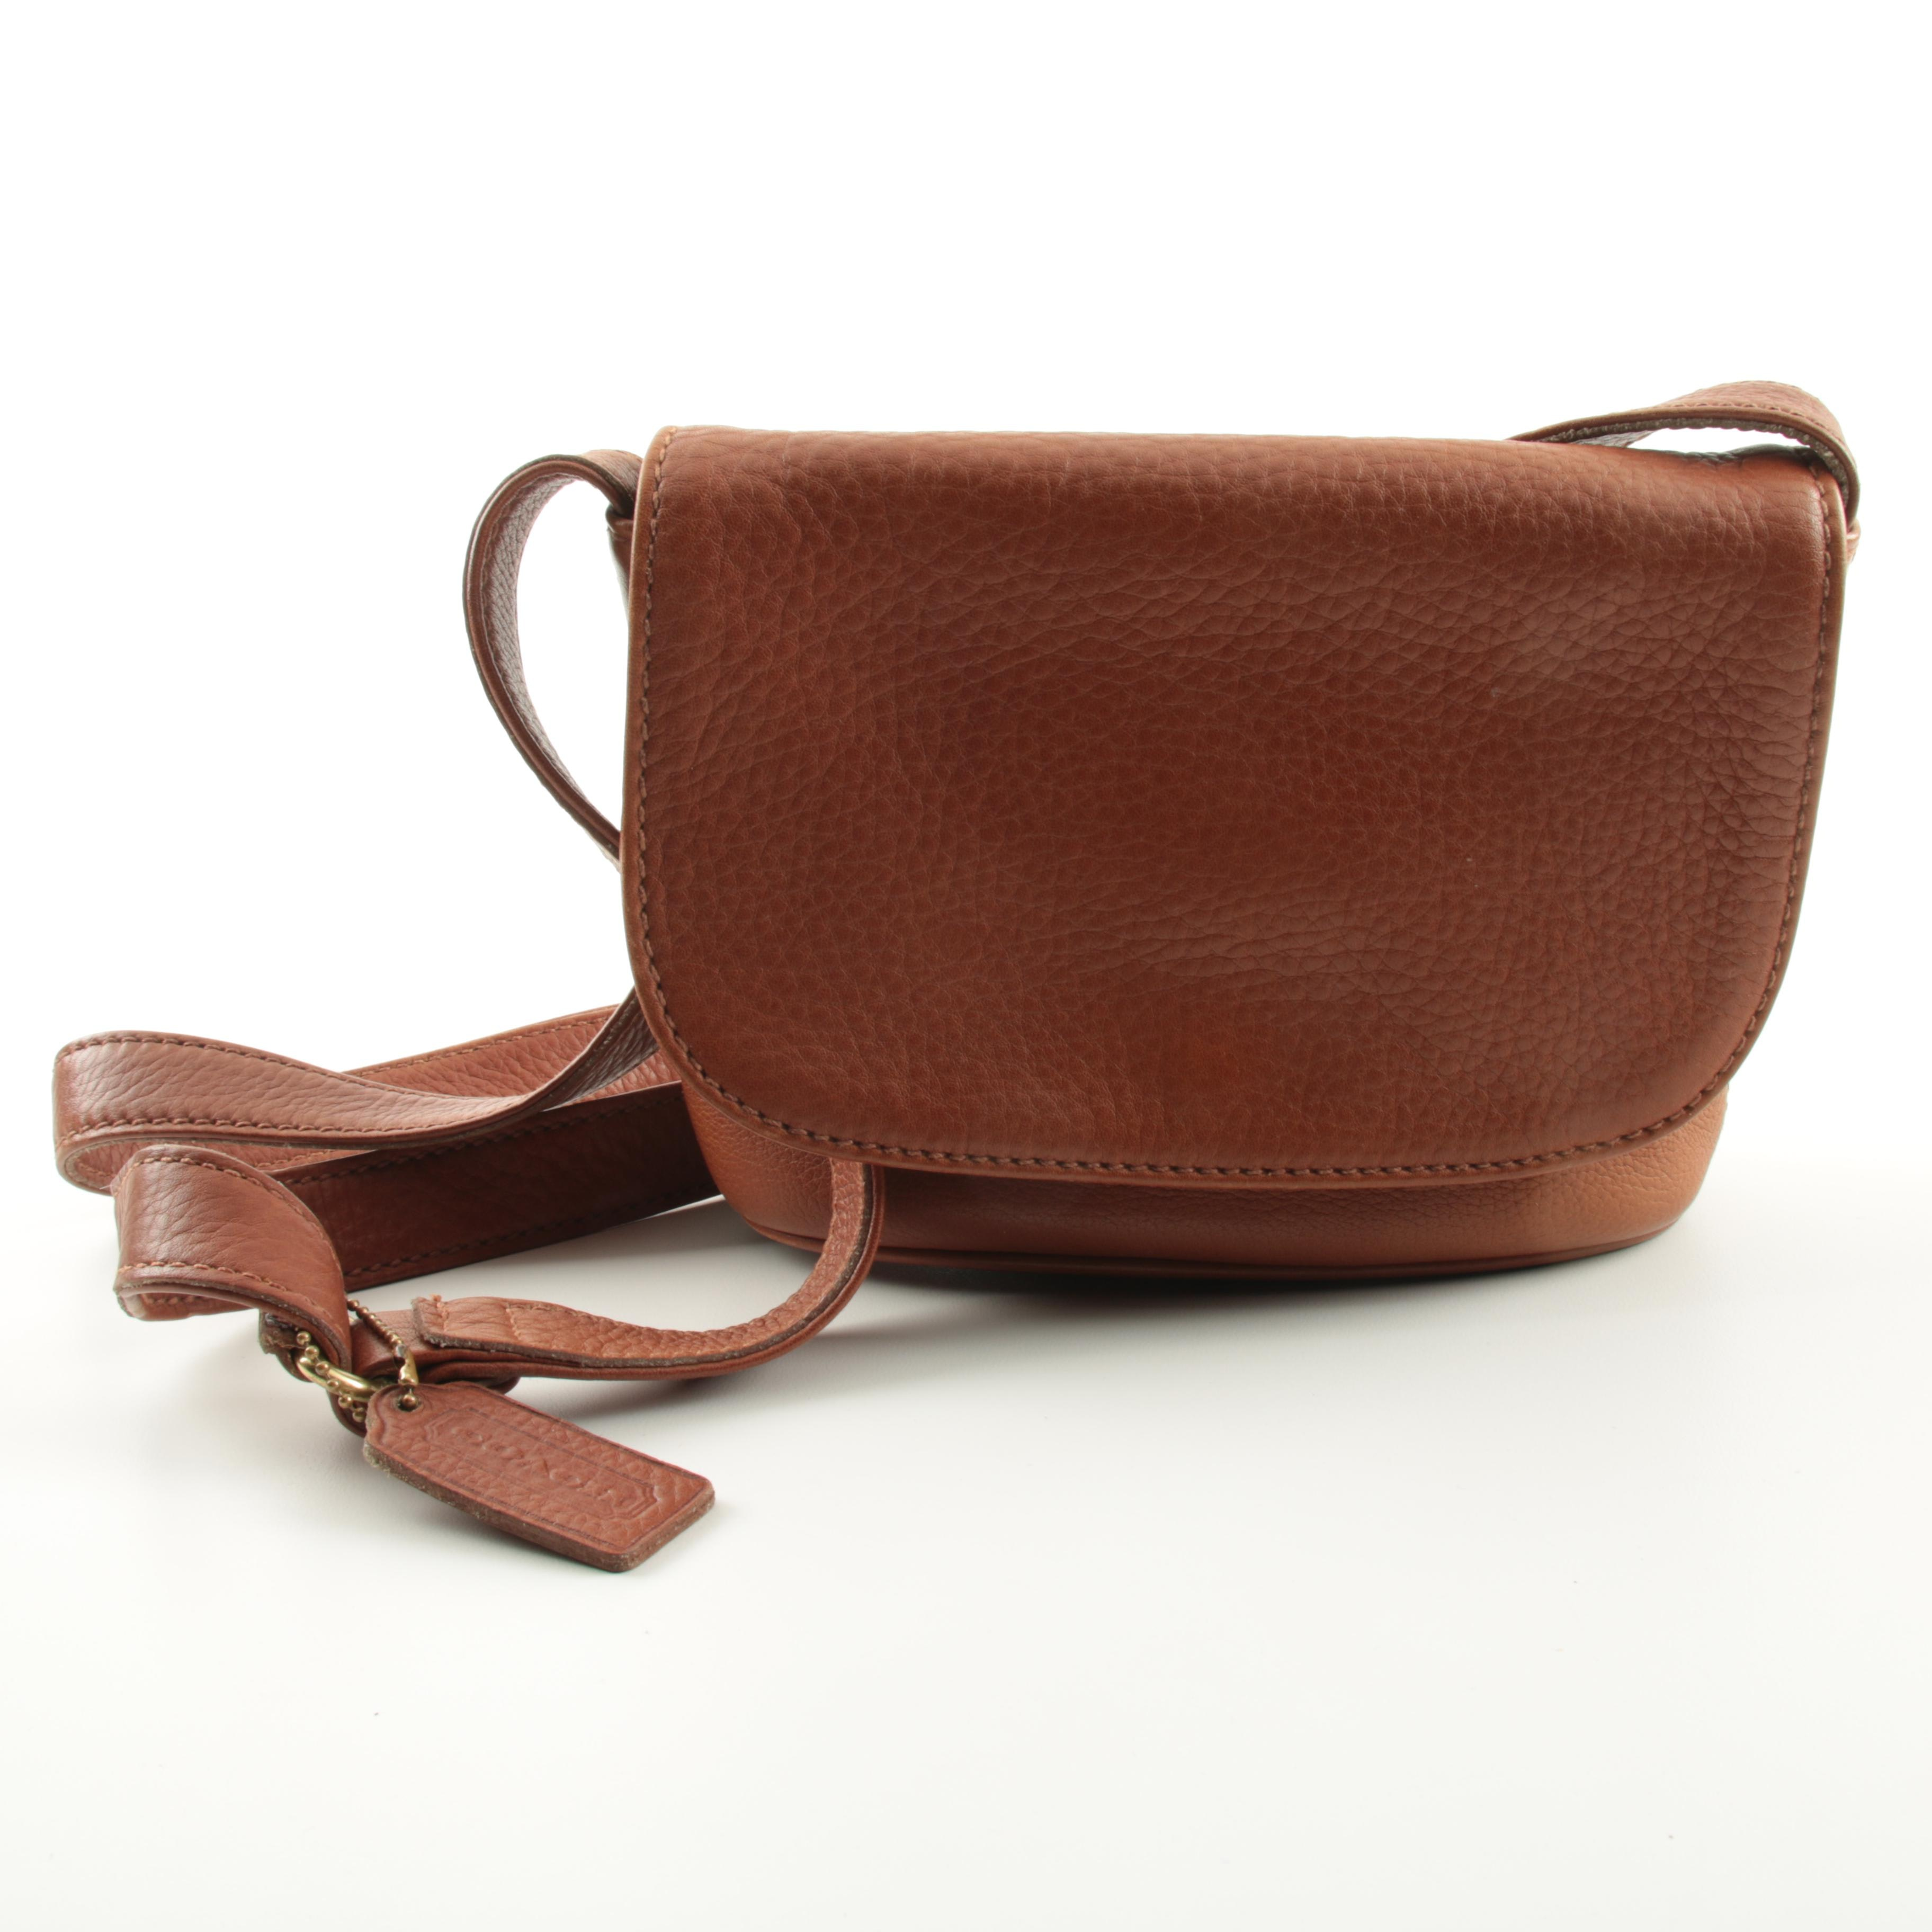 Coach Sonoma Flap Pebbled Leather Handbag